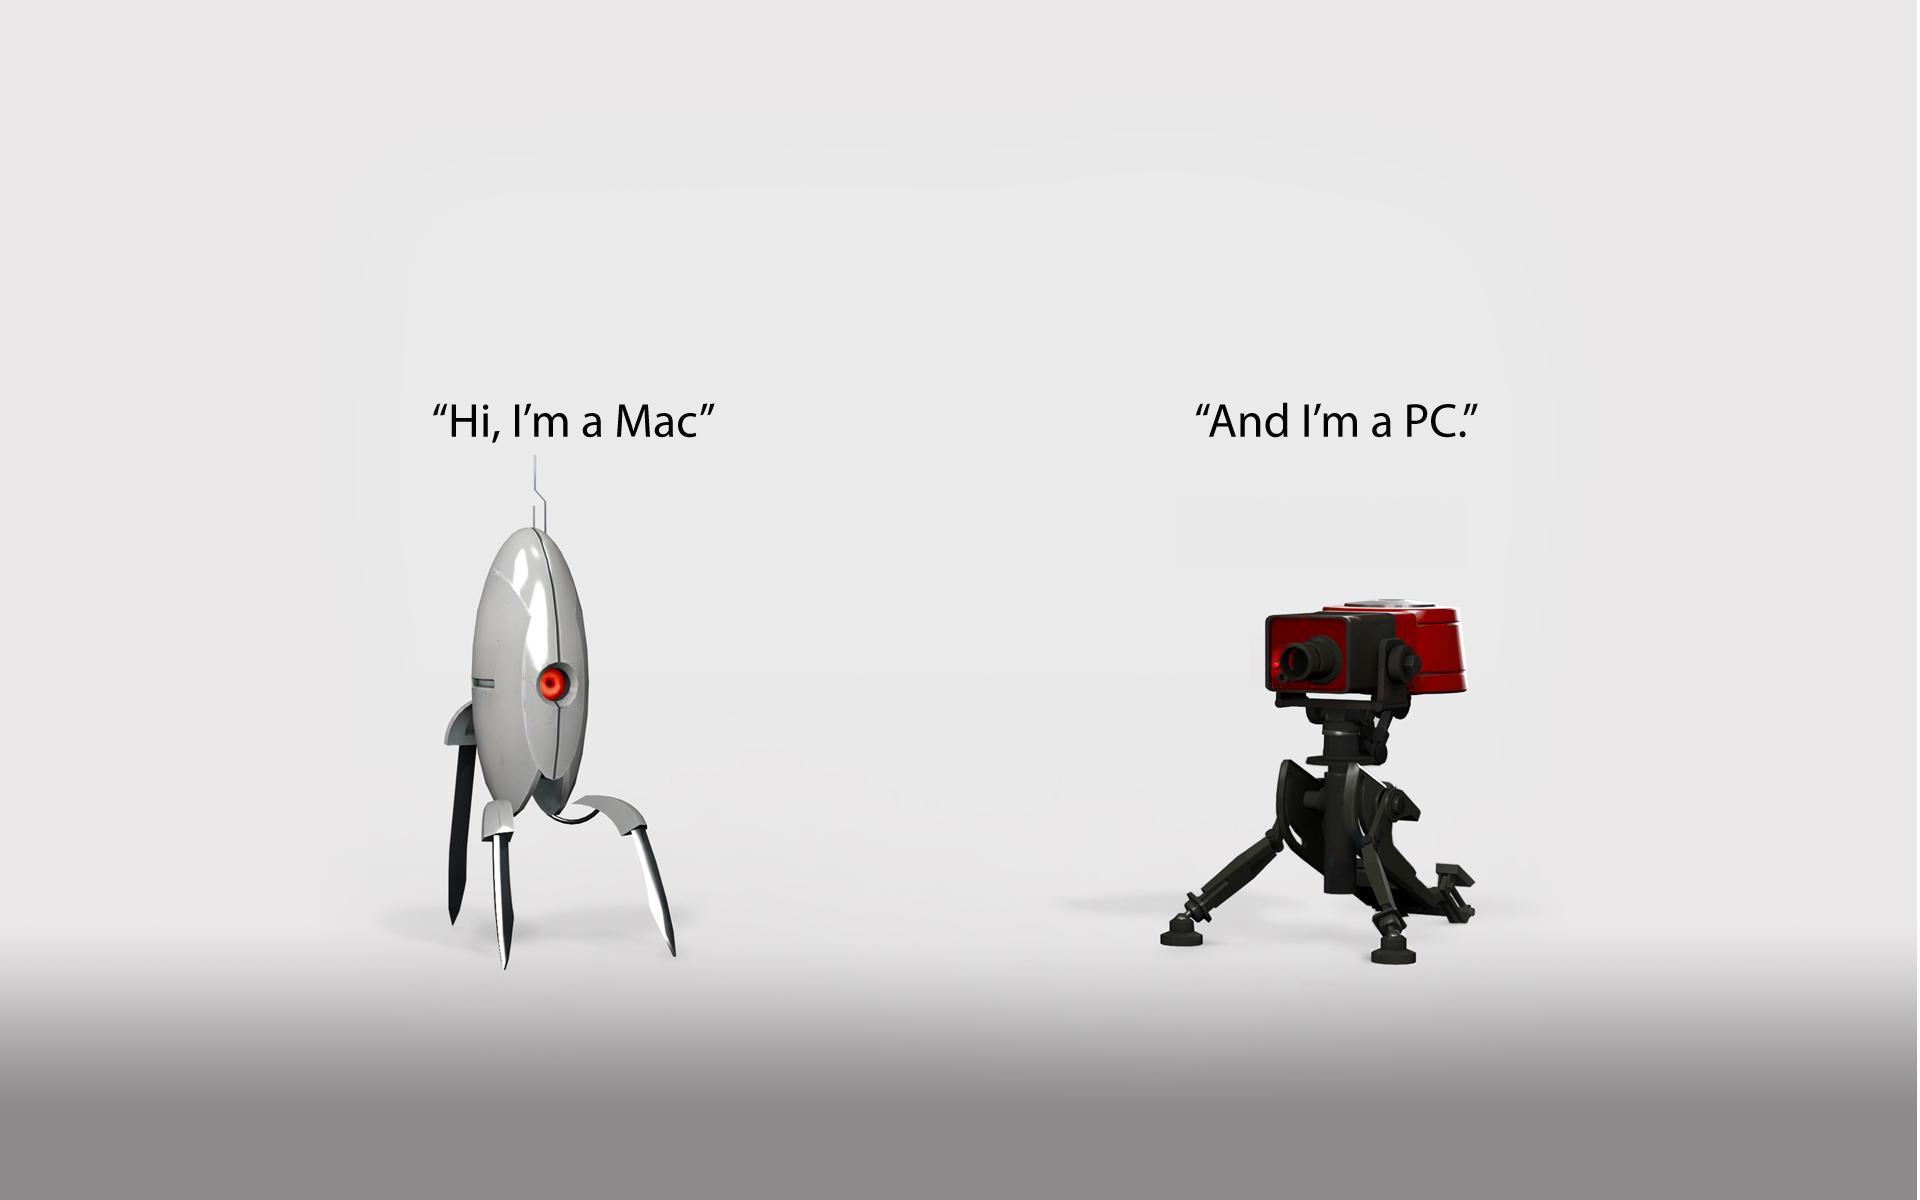 video games Valve Corporation Portal Mac PC Team Fortress 2